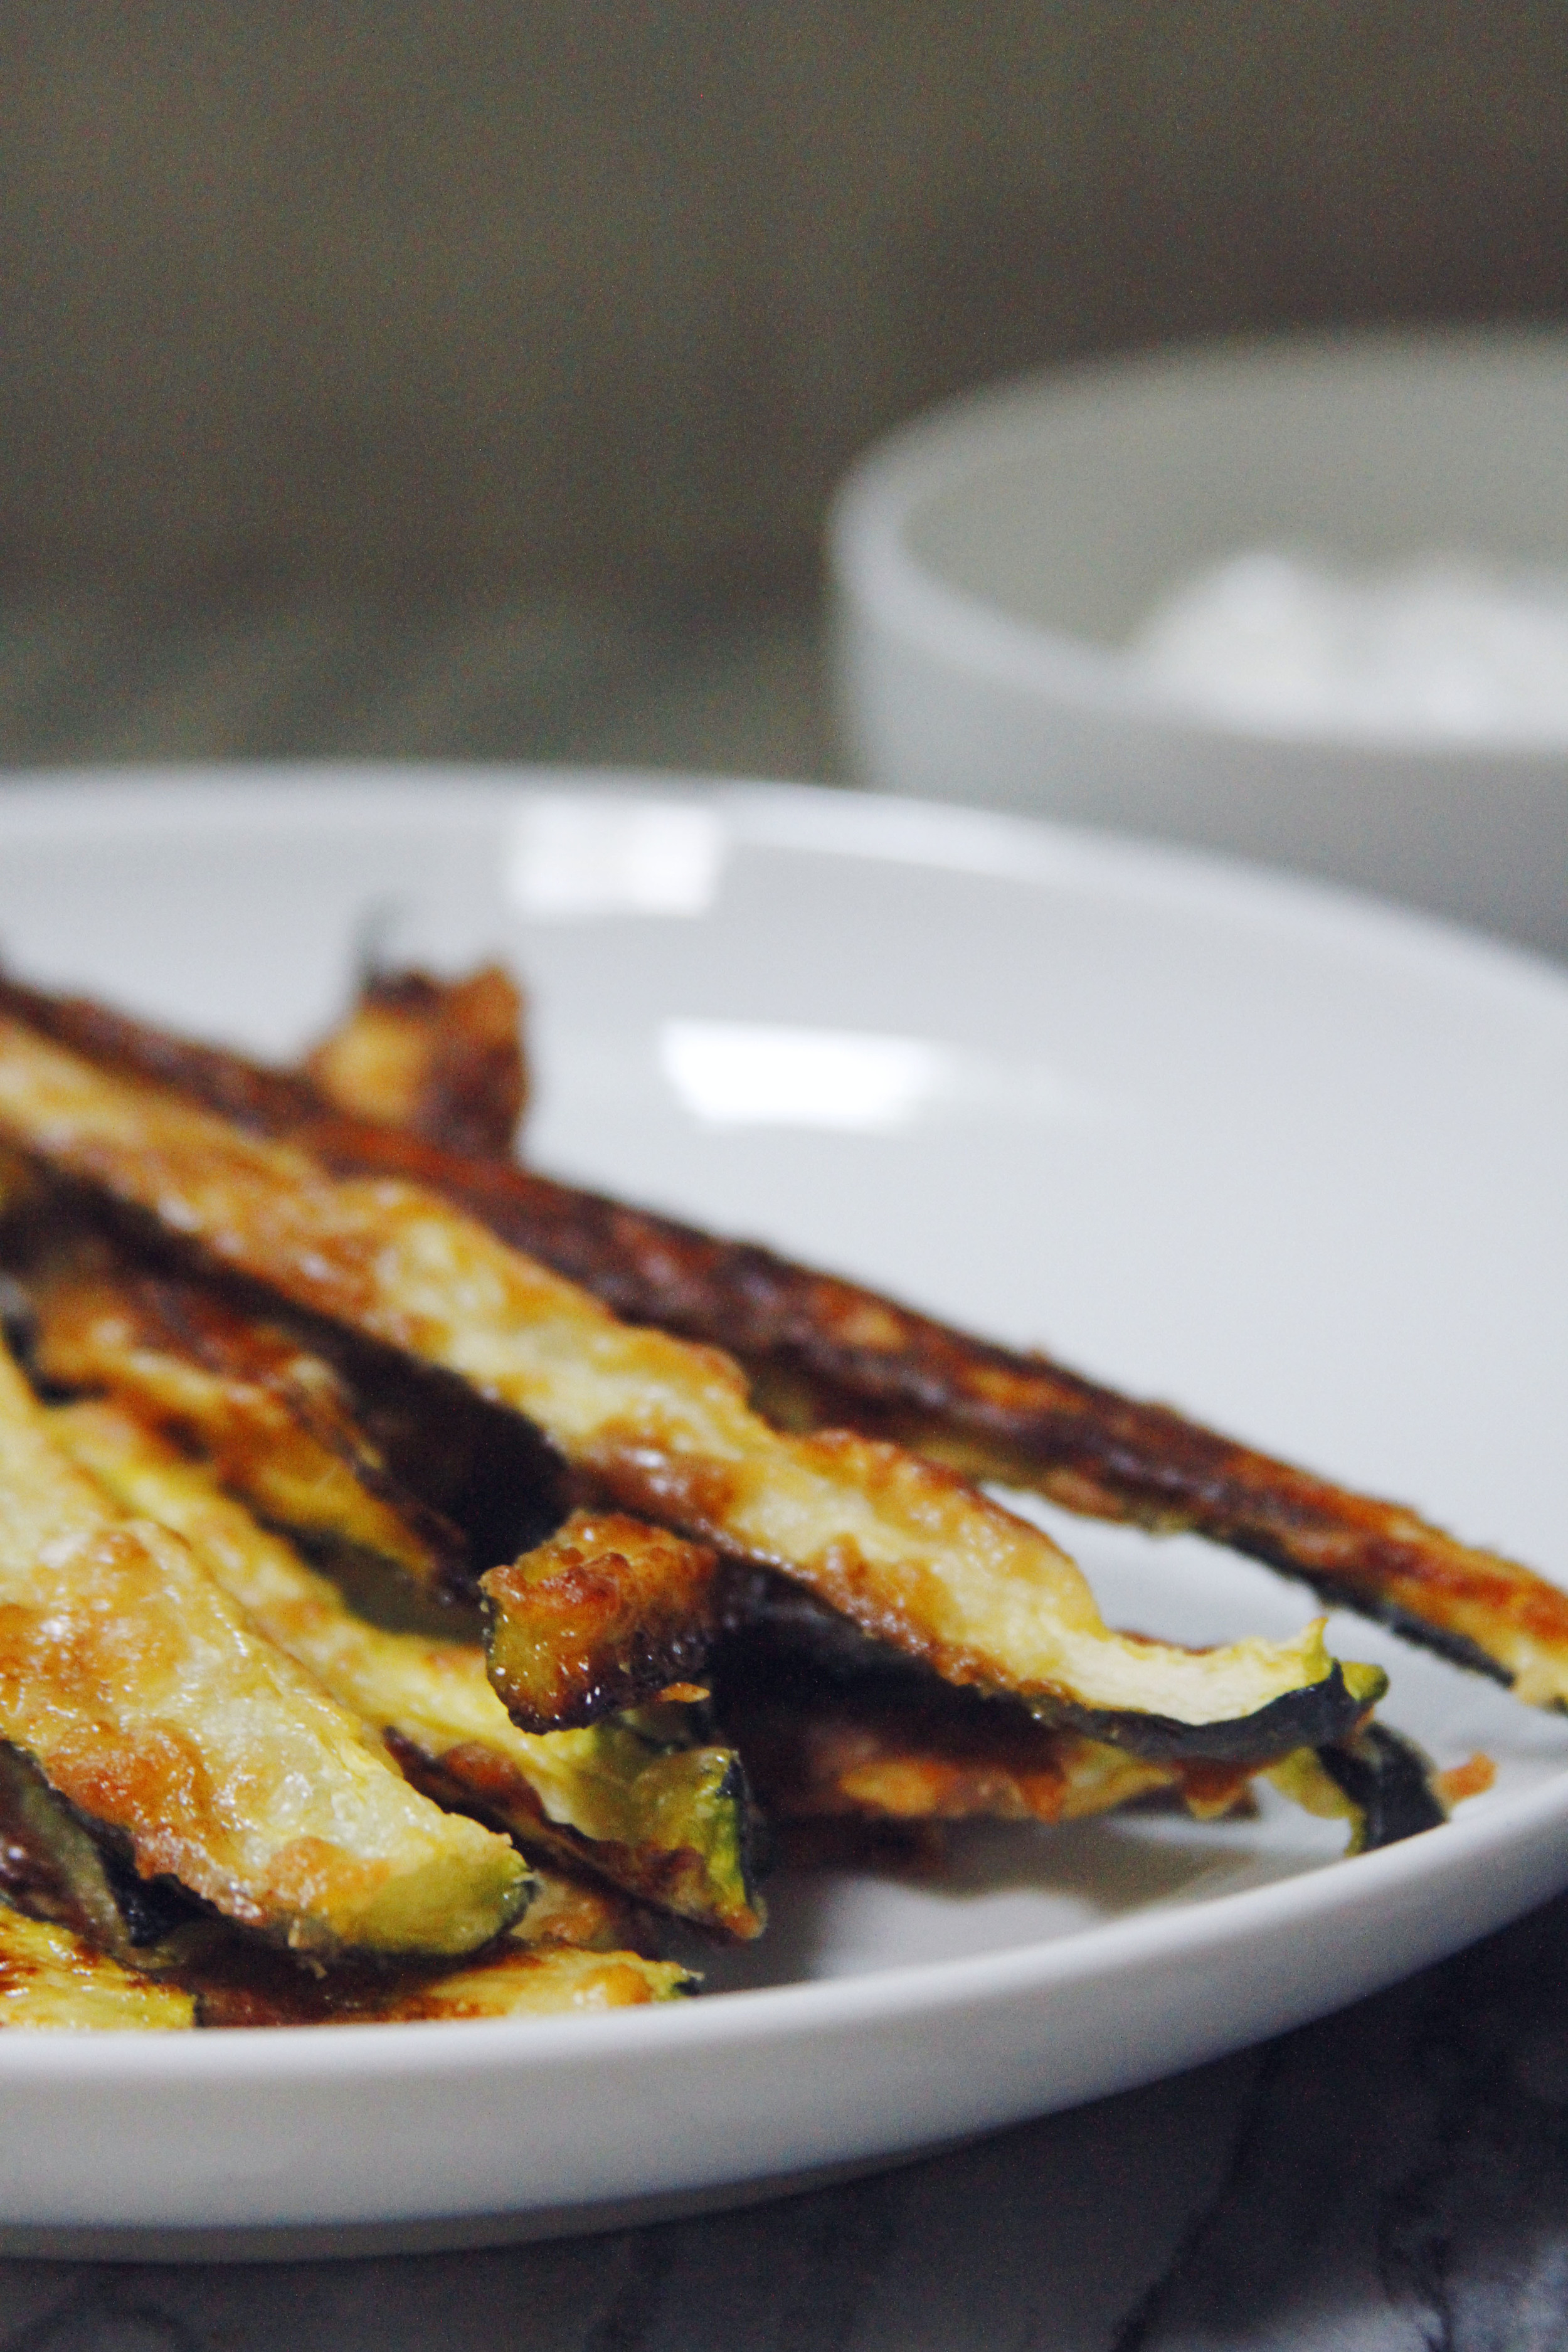 Crispy Zucchini Fries with Herbed Yogurt